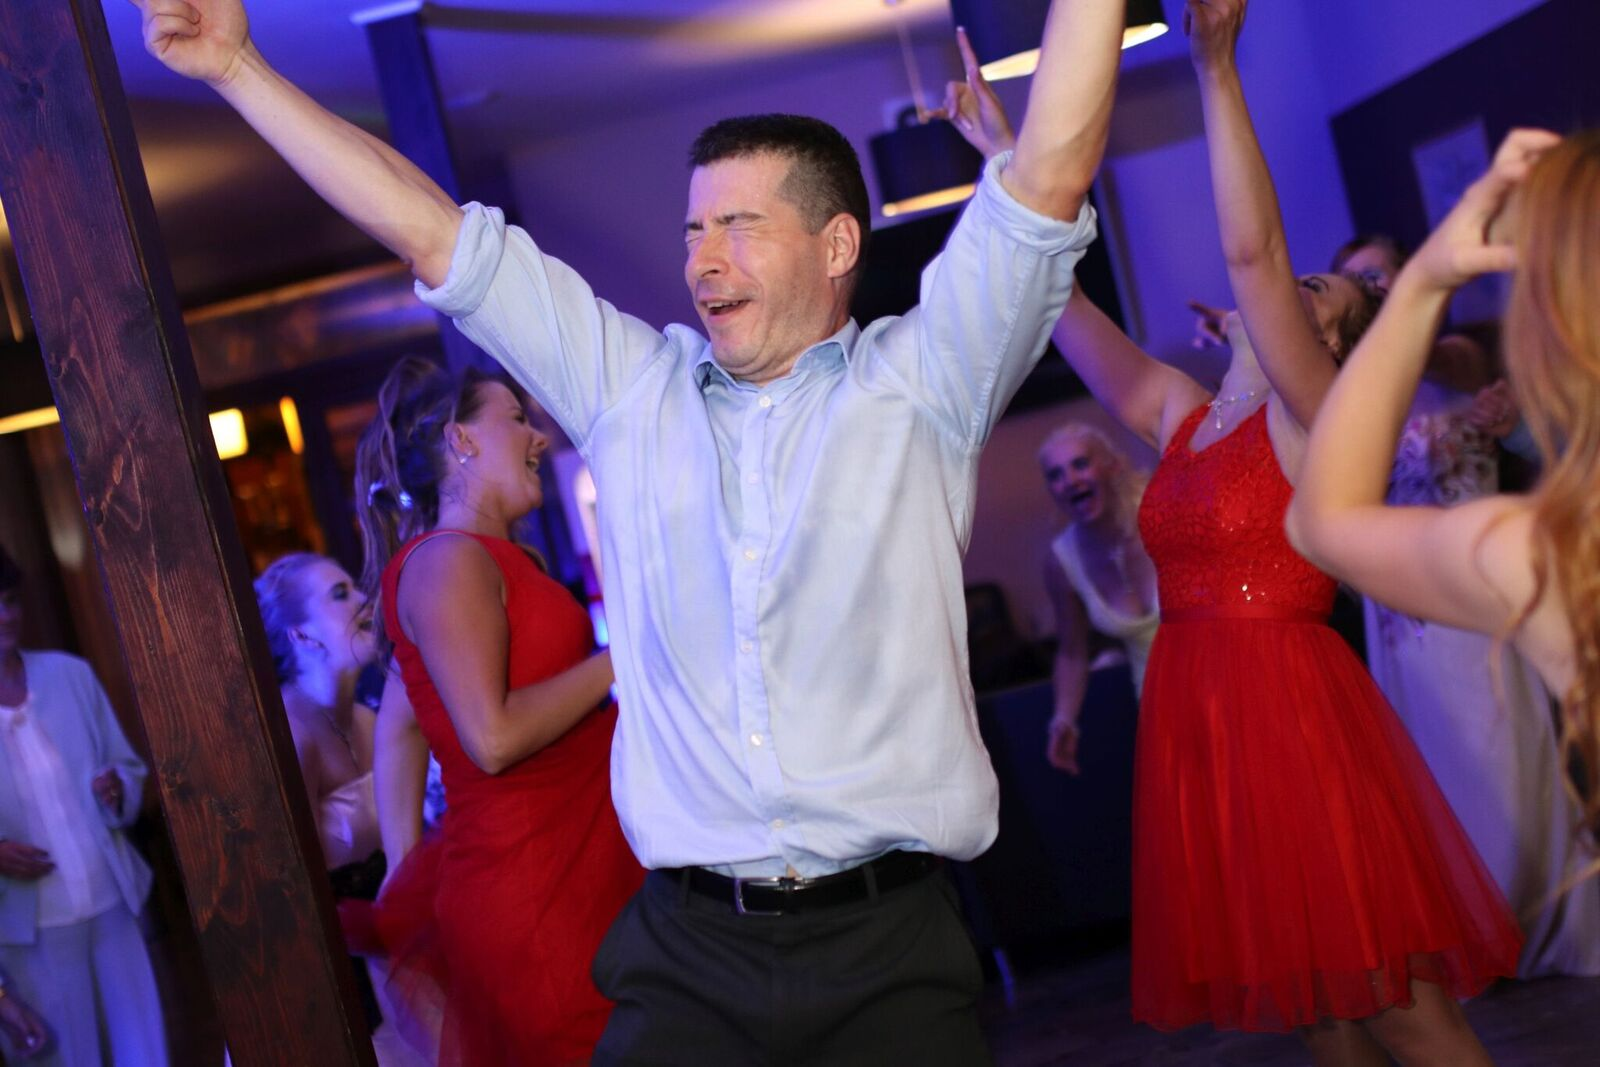 #Svadba Kaštieľ Betliar 04, #svadobný DJ, #svadba Betliar